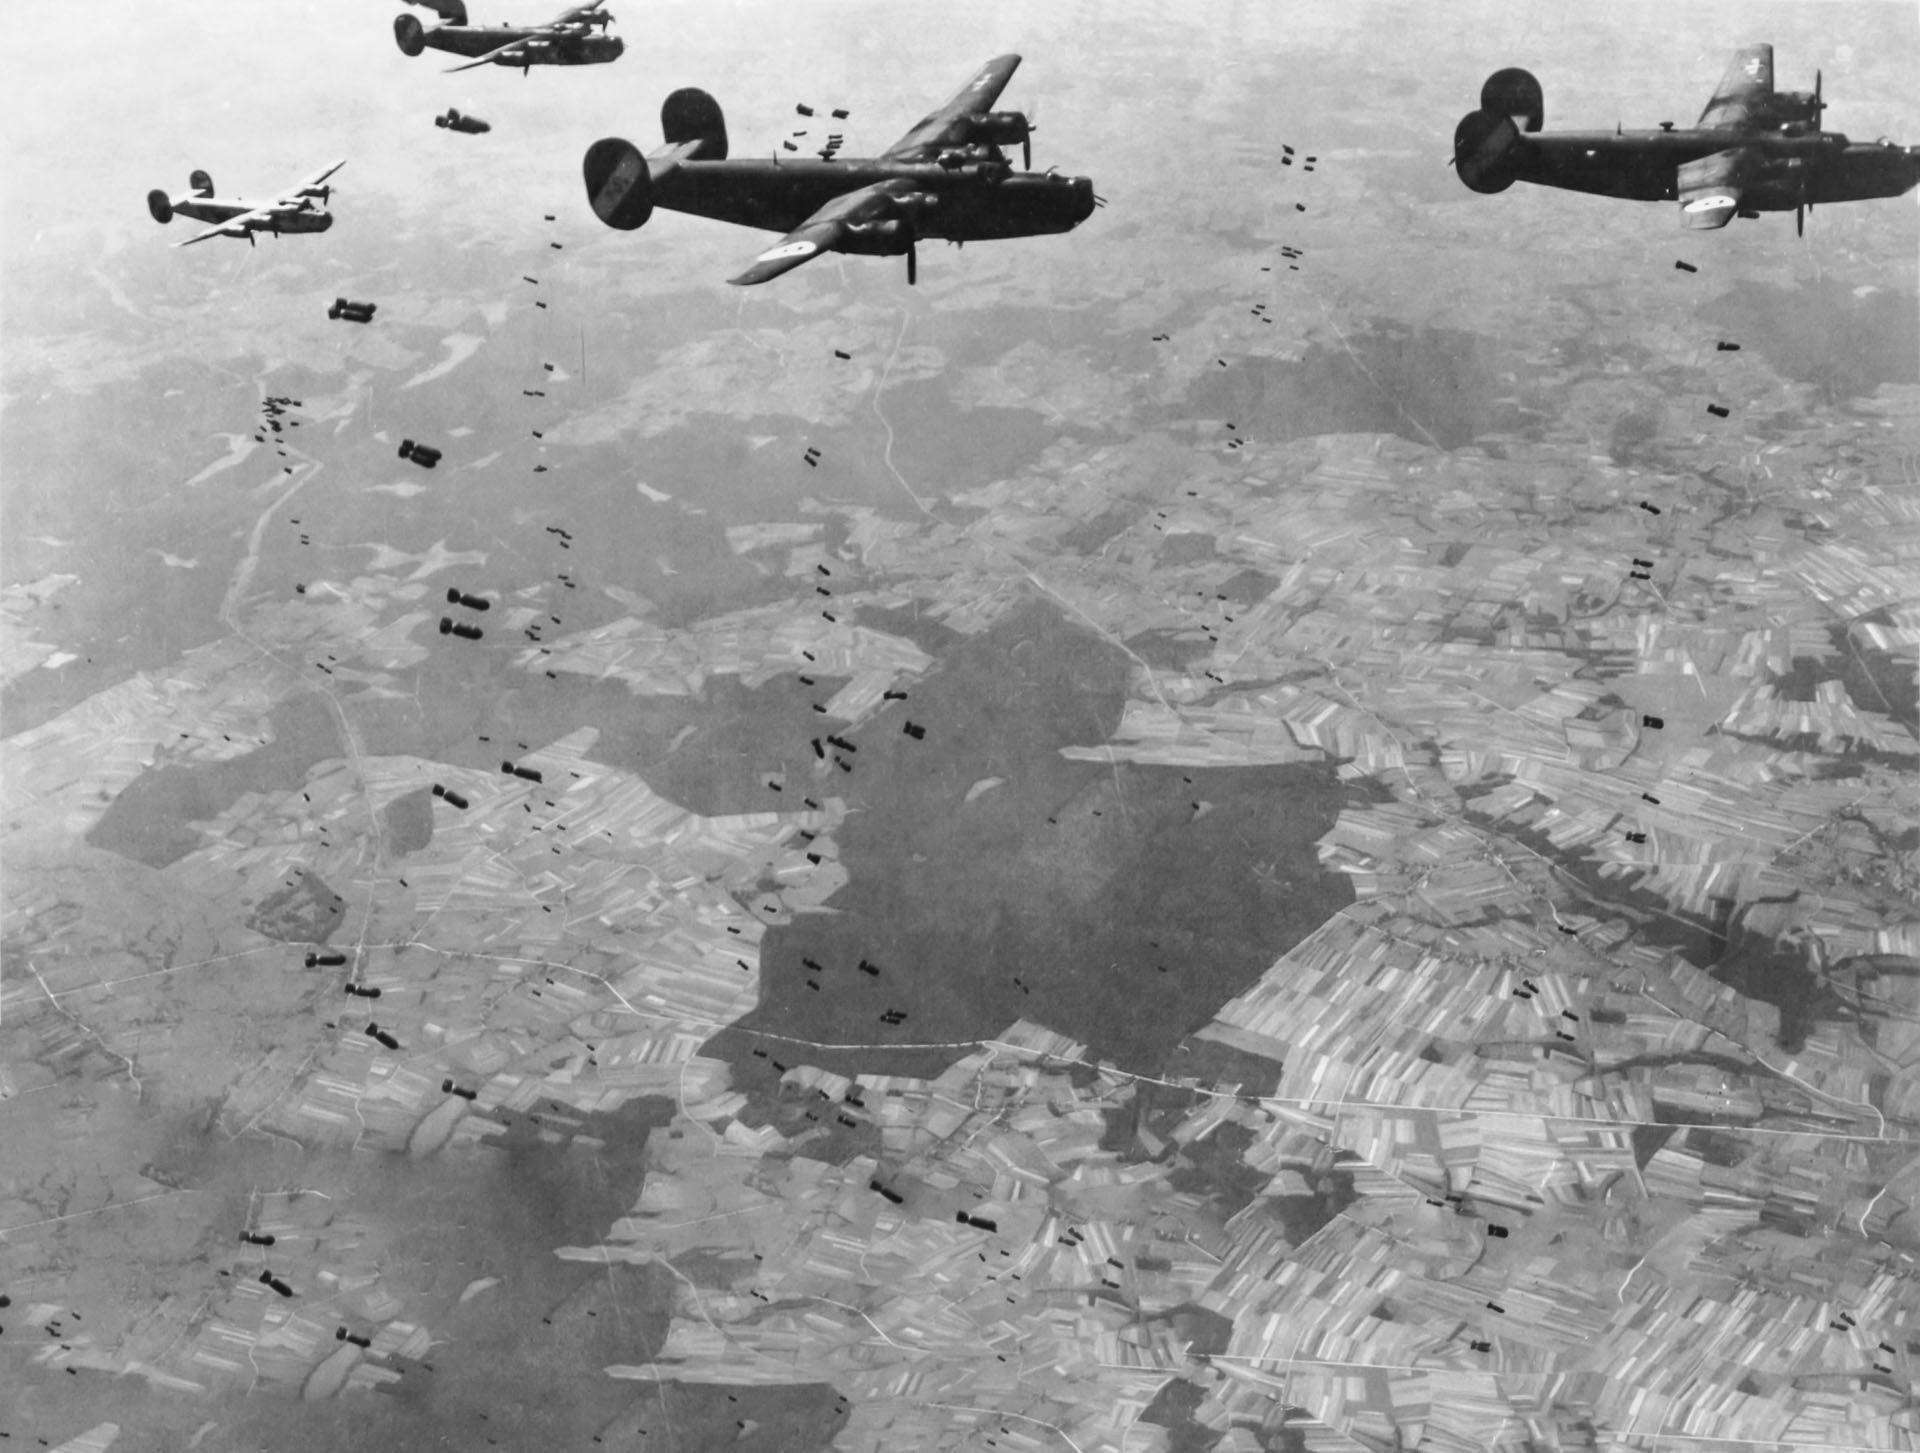 791st Bombardment Squadron